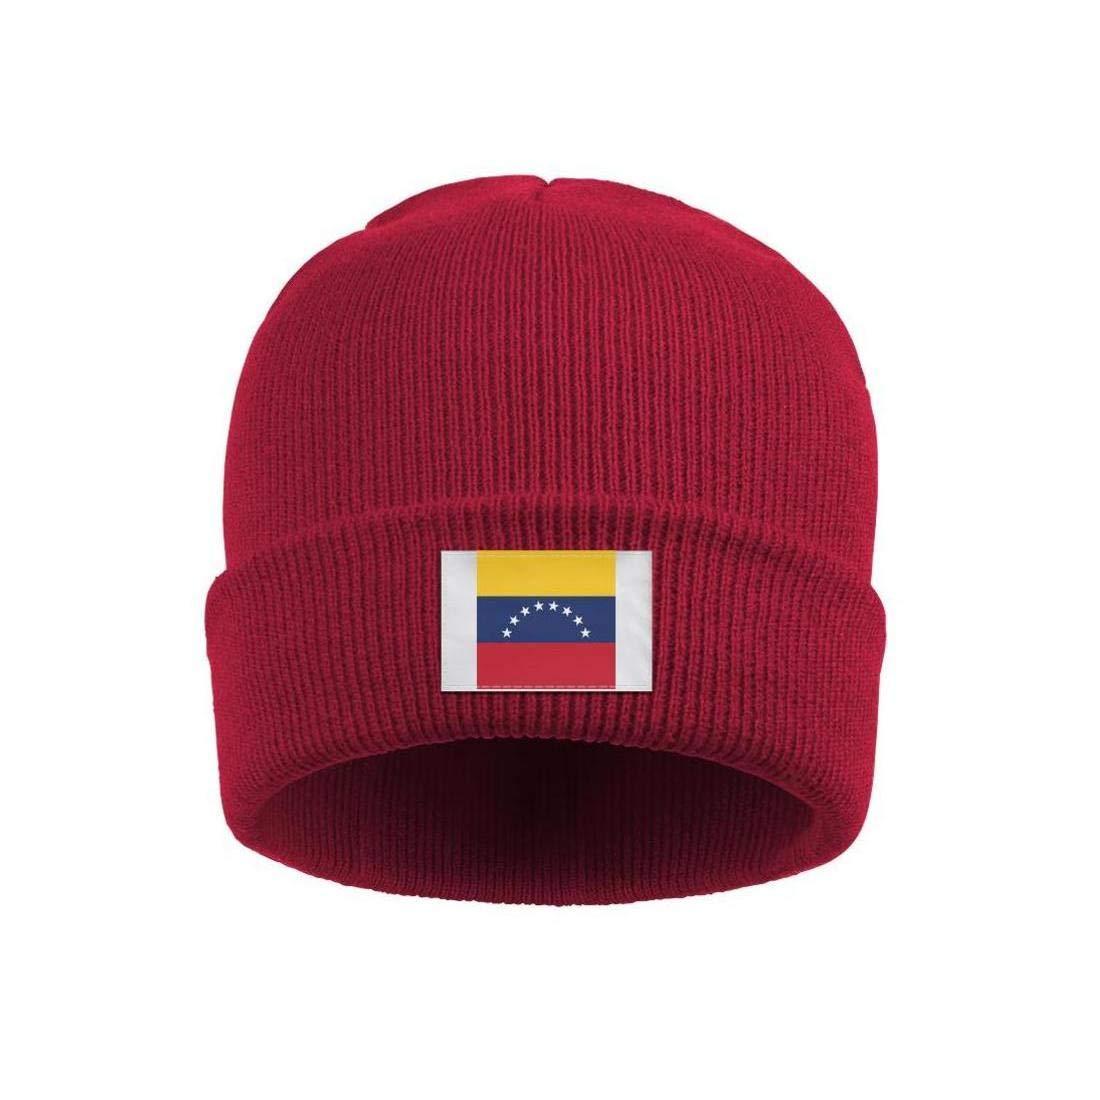 Winter Beanie Hat Trinidad and Tobago Flag Knit Skull Cap for Men Women